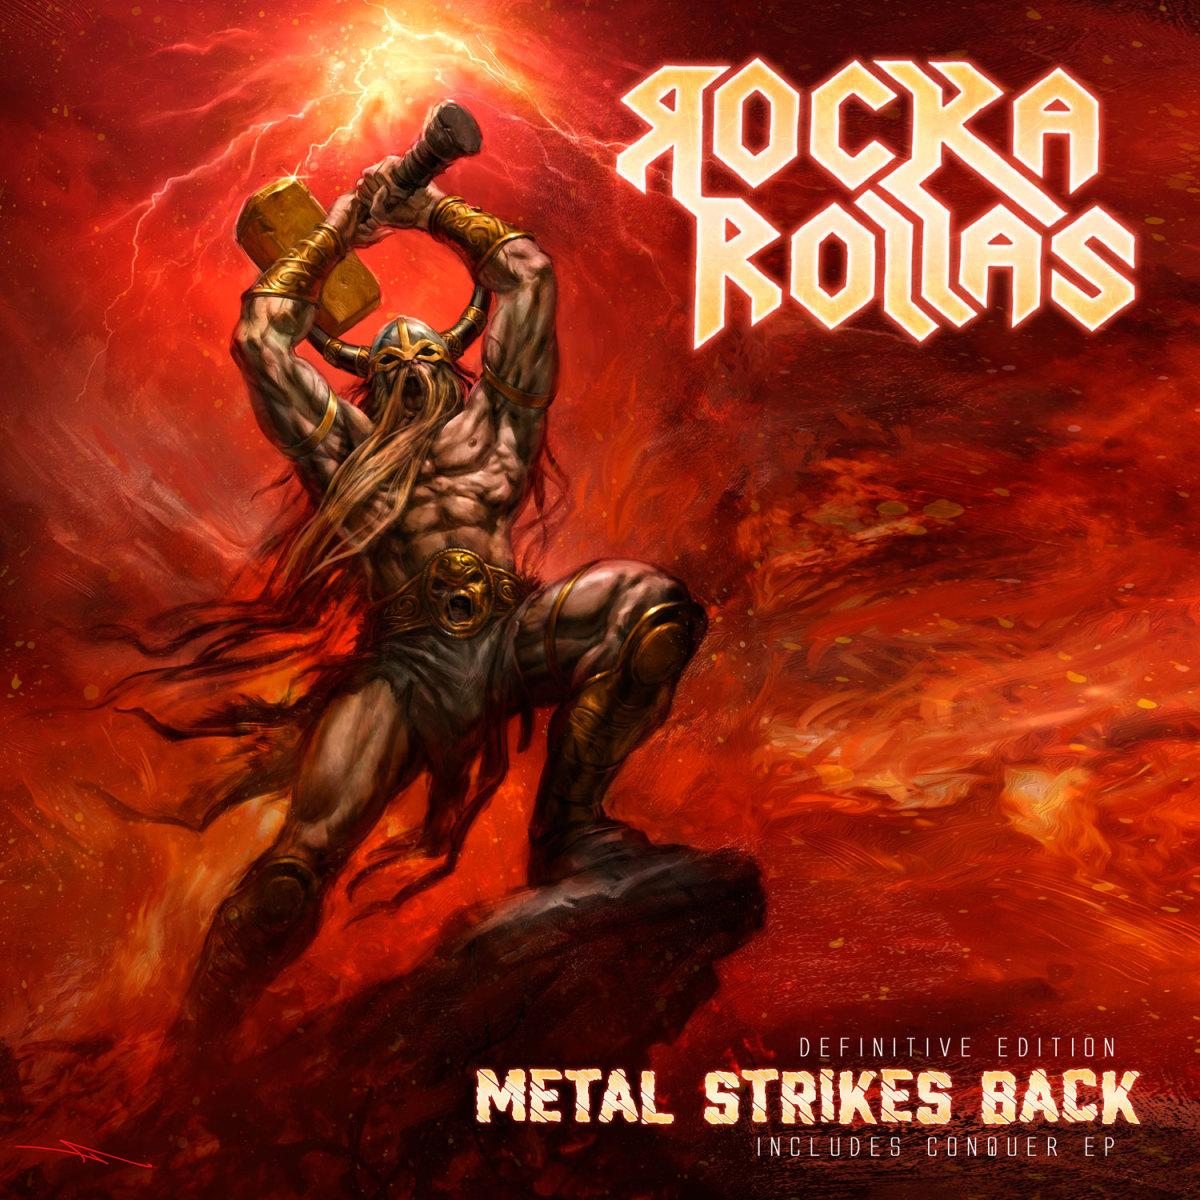 rocka-rollas-metal-strikes-back-definitive-edition-review